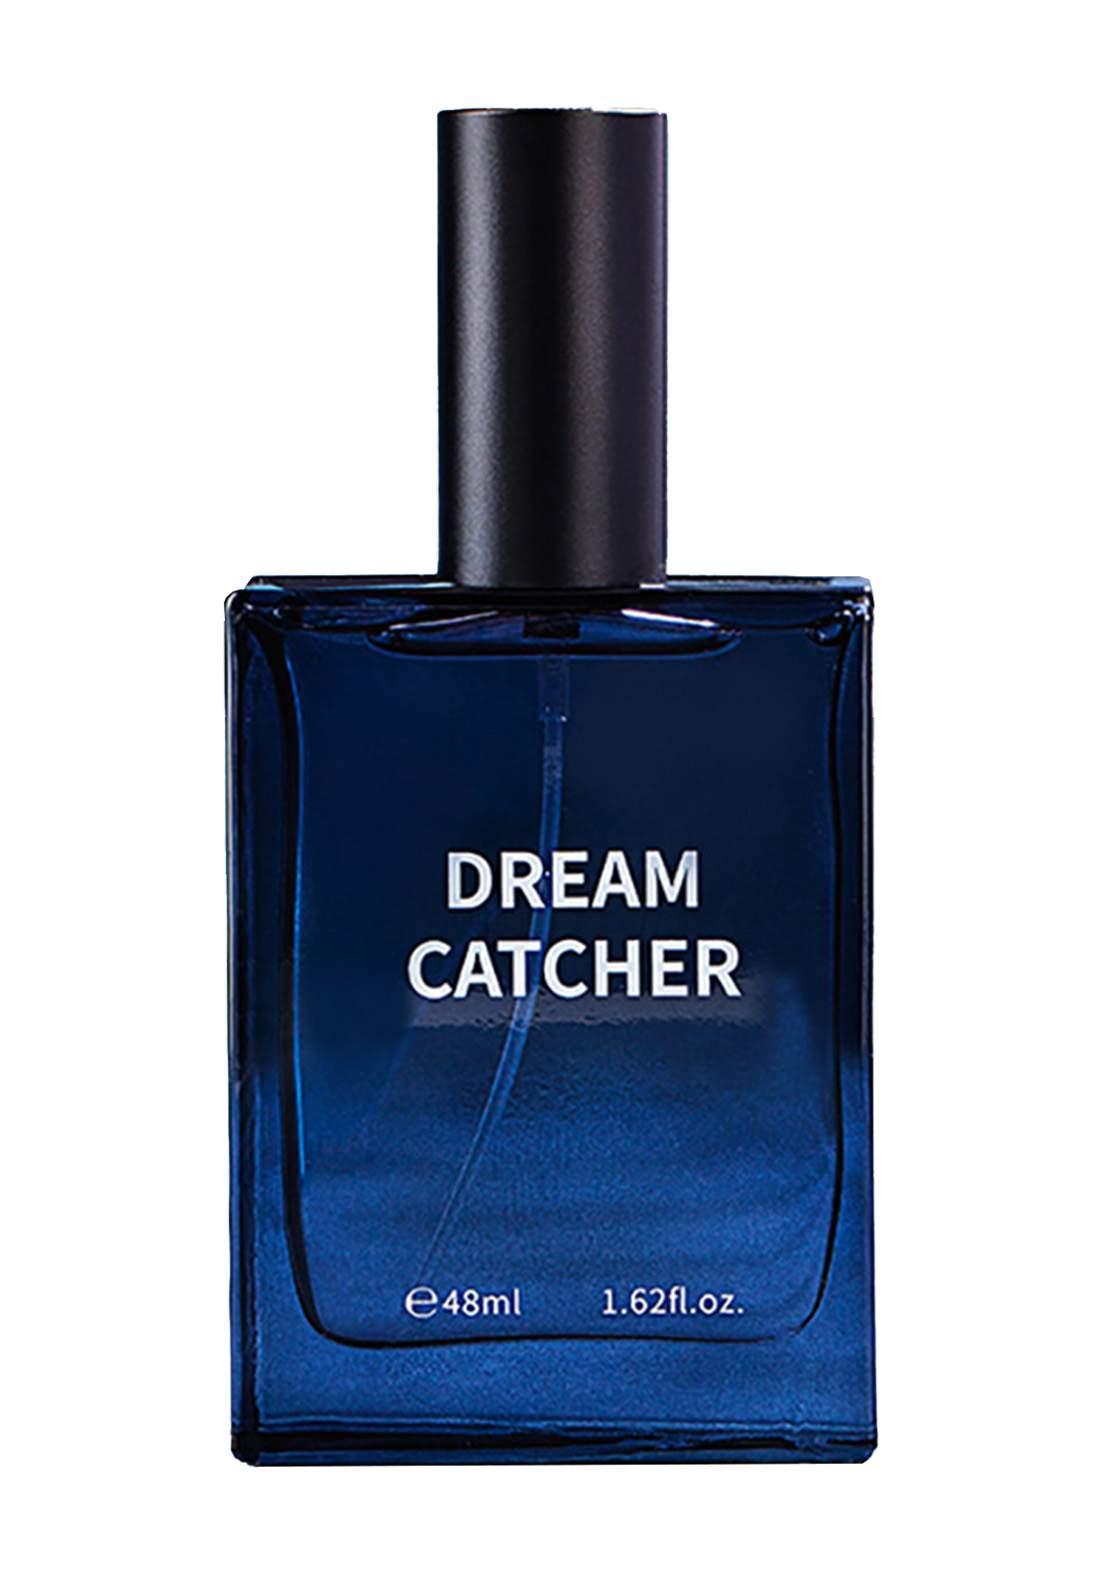 Ilahui Dream Catcher Perfume 48 ml عطر رجالي